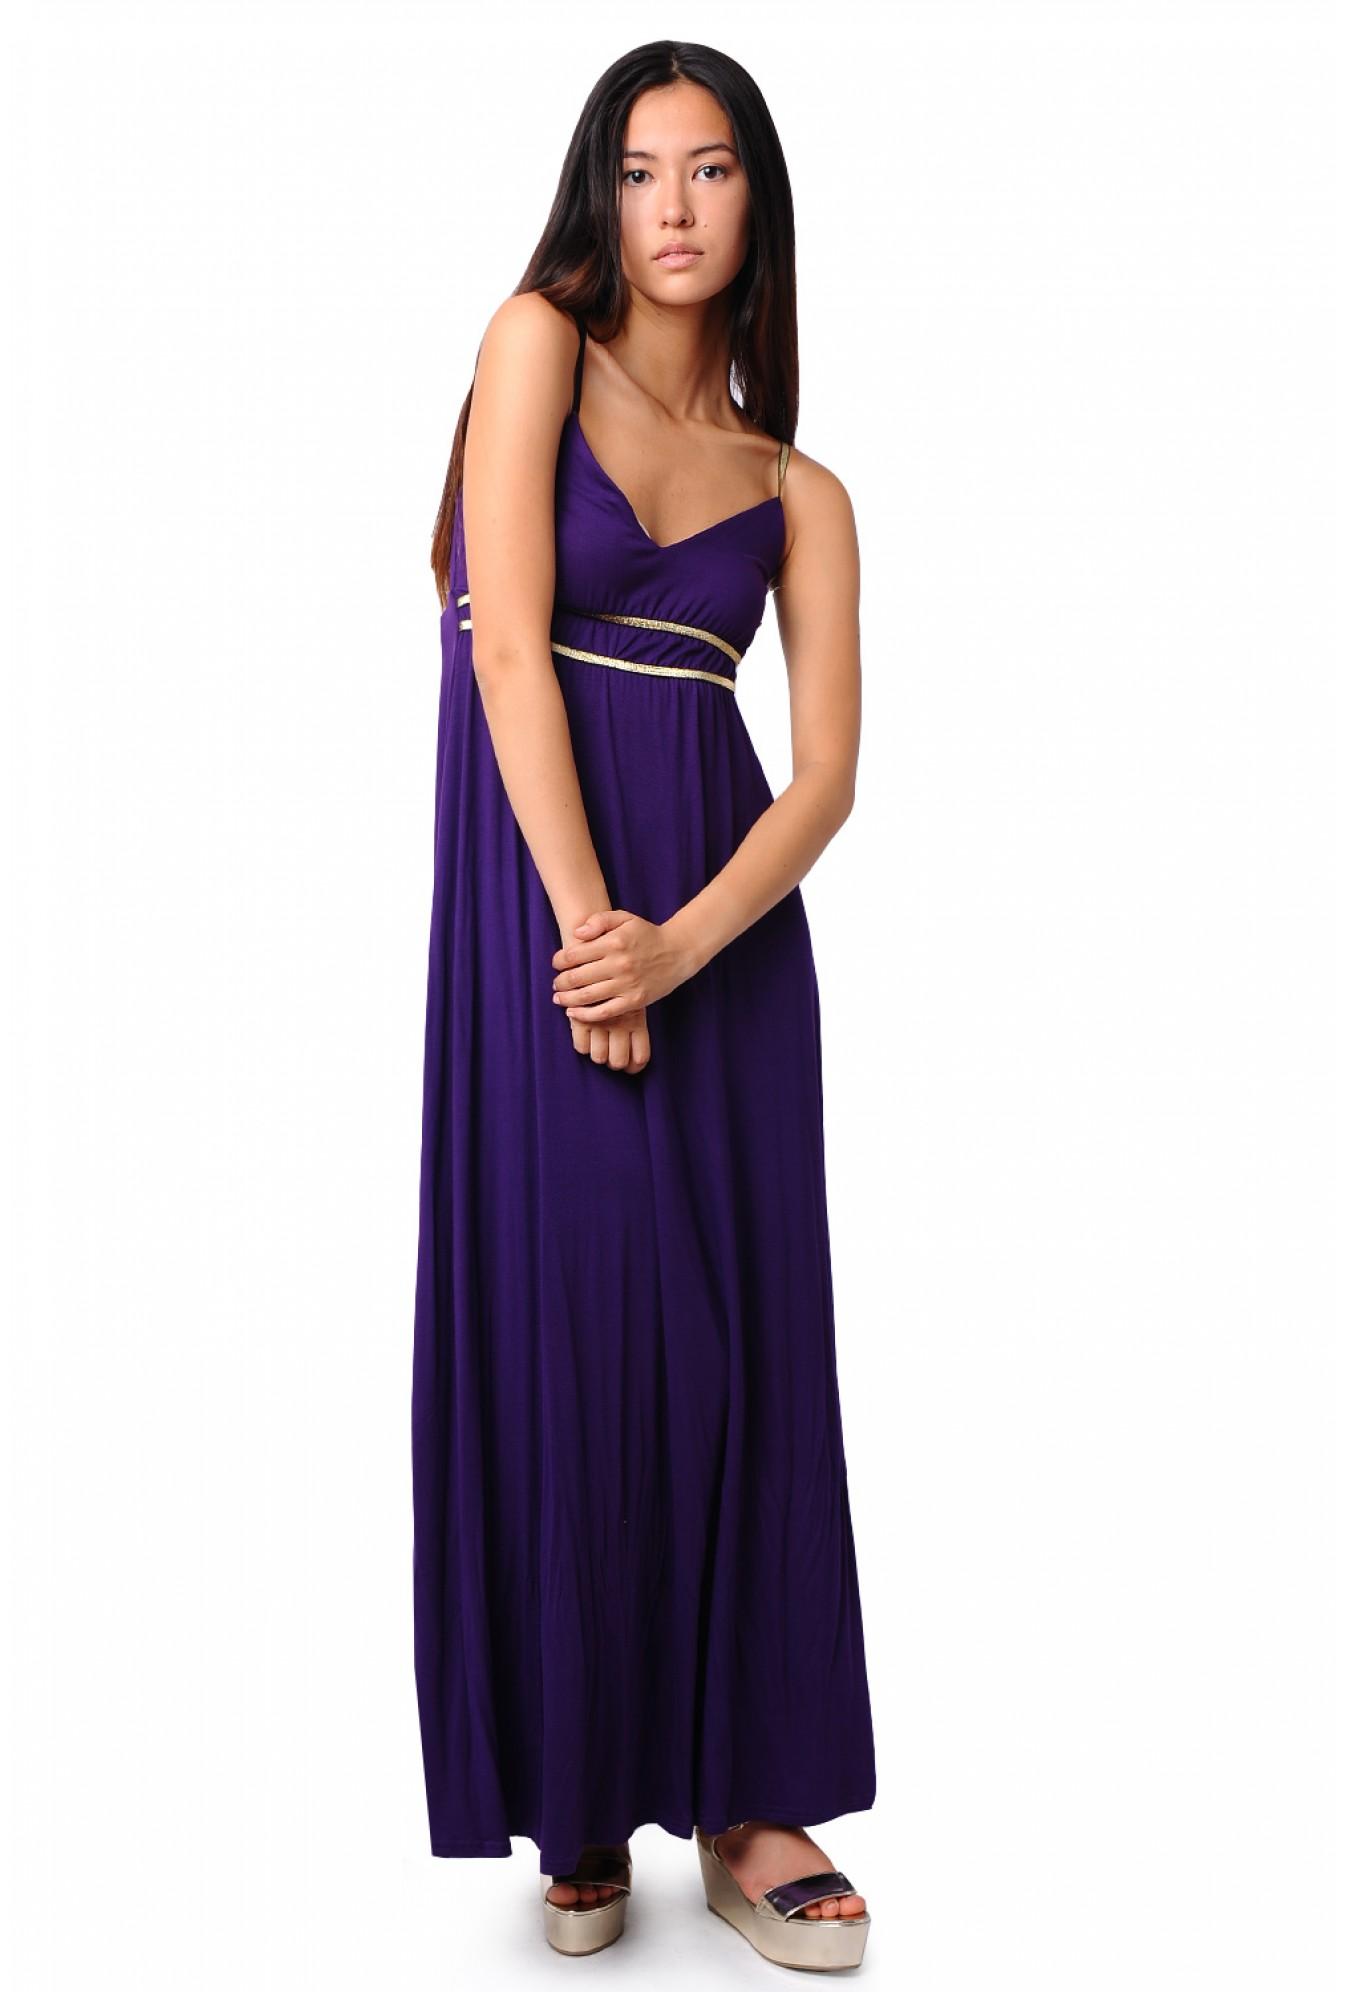 42d350a0f71 More Views. Sue Grecian Maxi Dress in Purple. John Zack